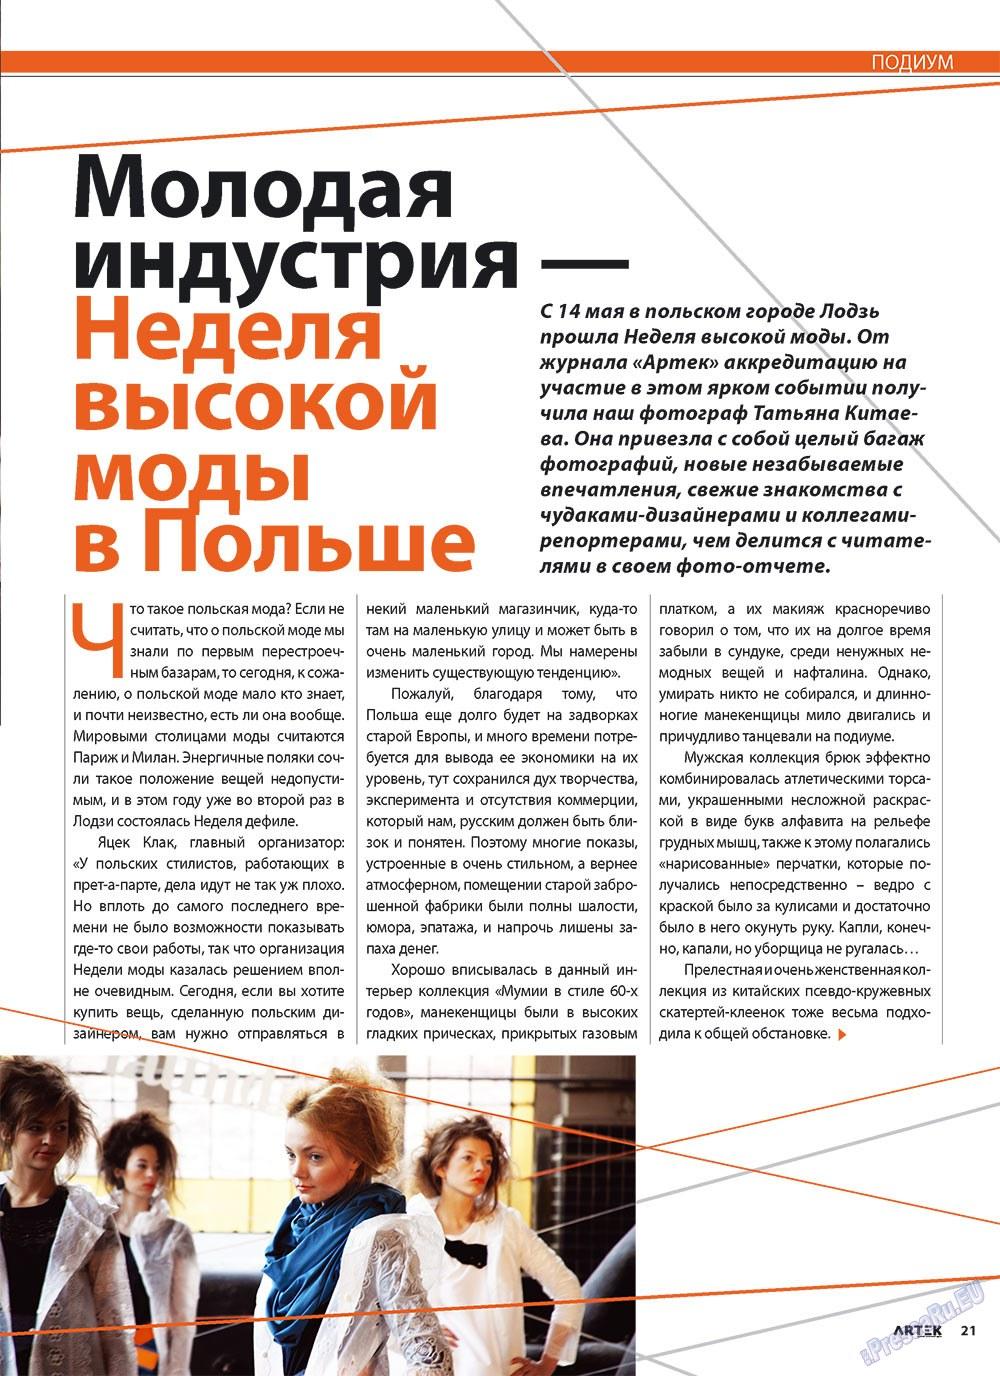 Артек (журнал). 2010 год, номер 3, стр. 23